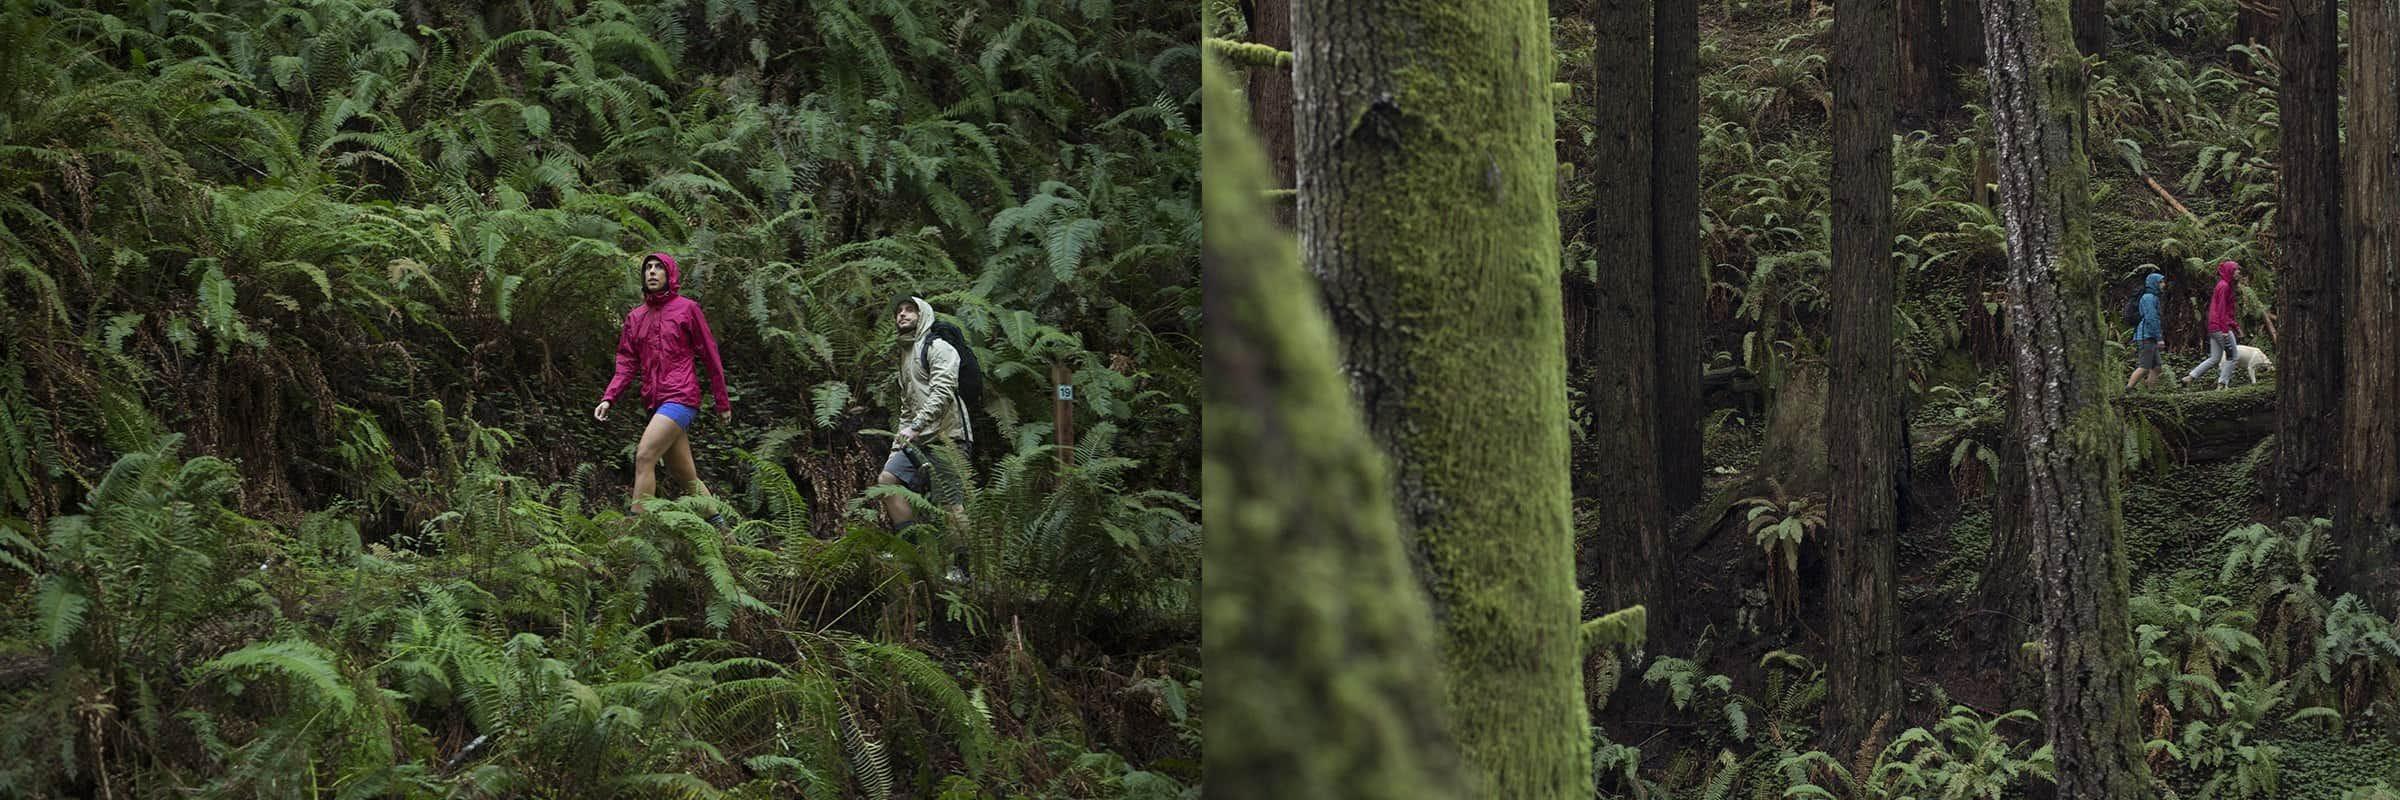 wet rainforest and ferns